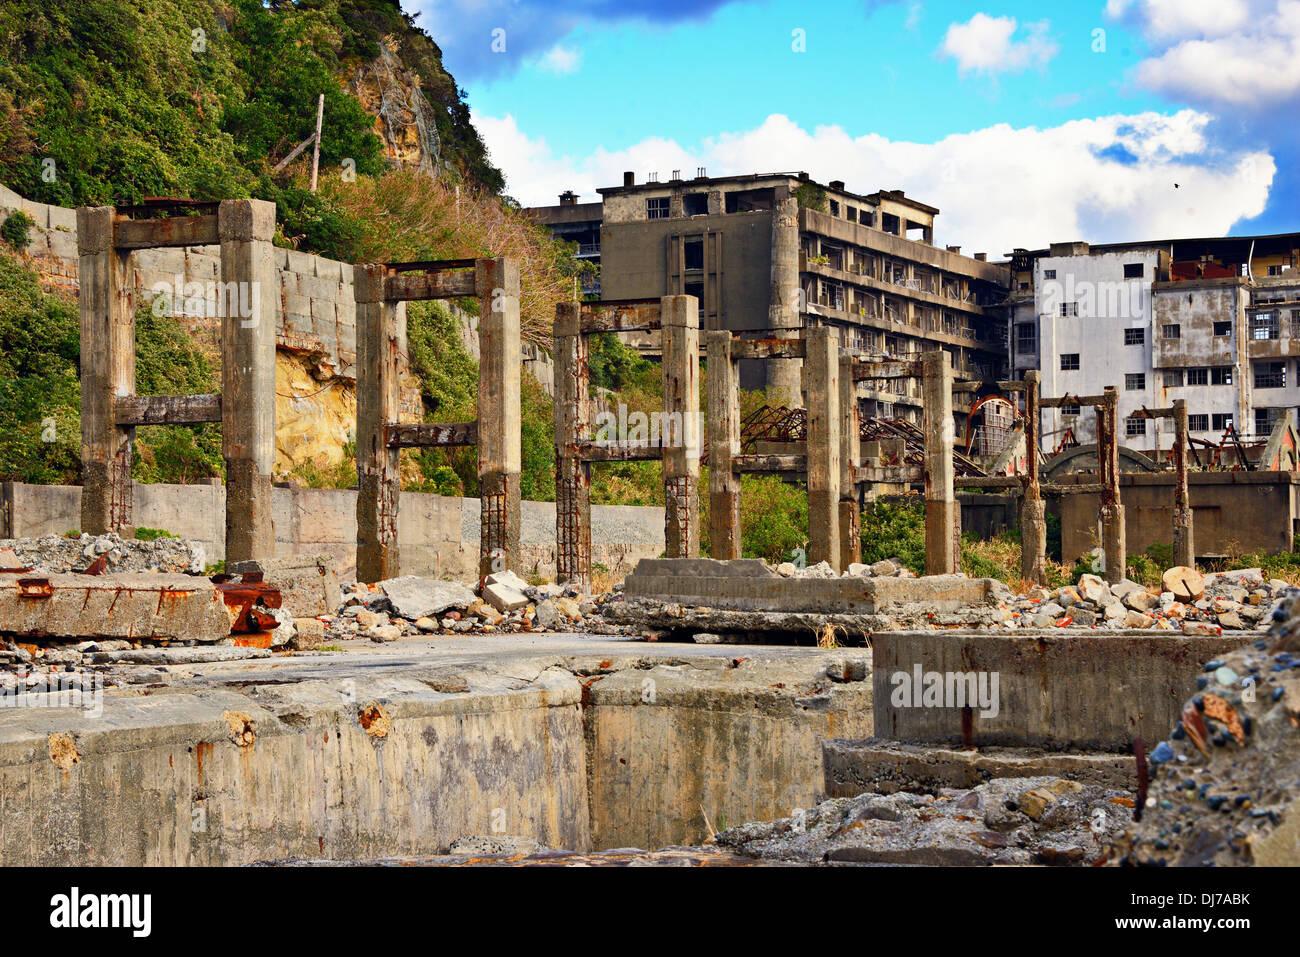 L'île de Gunkanjima industriels abandonnés, Nagasaki, Japon. Photo Stock